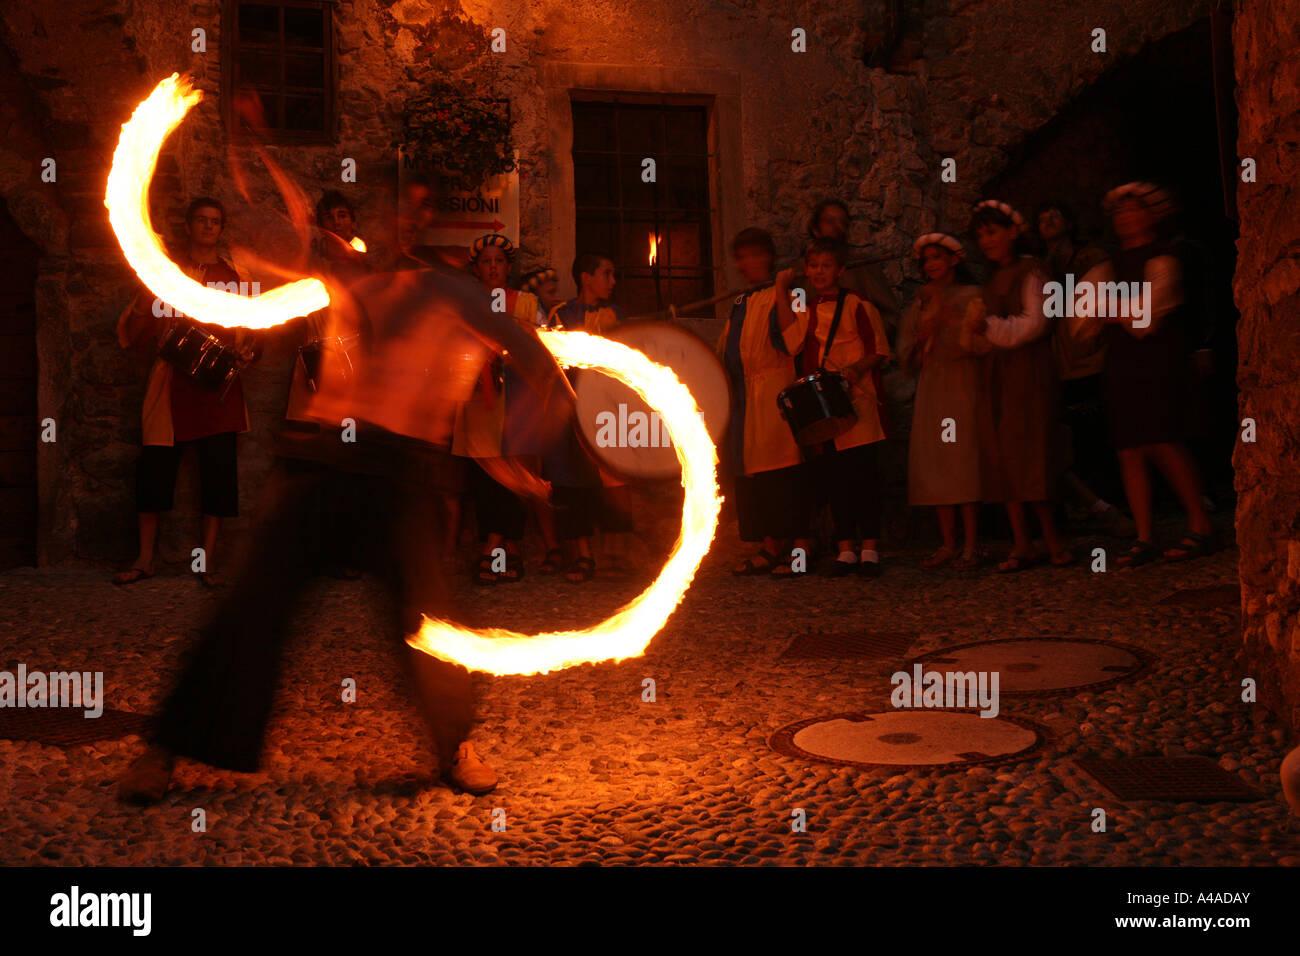 Entertainment with fire during Rustico Medioevo manifestation Canale di Tenno Trentino Alto Adige Italy - Stock Image